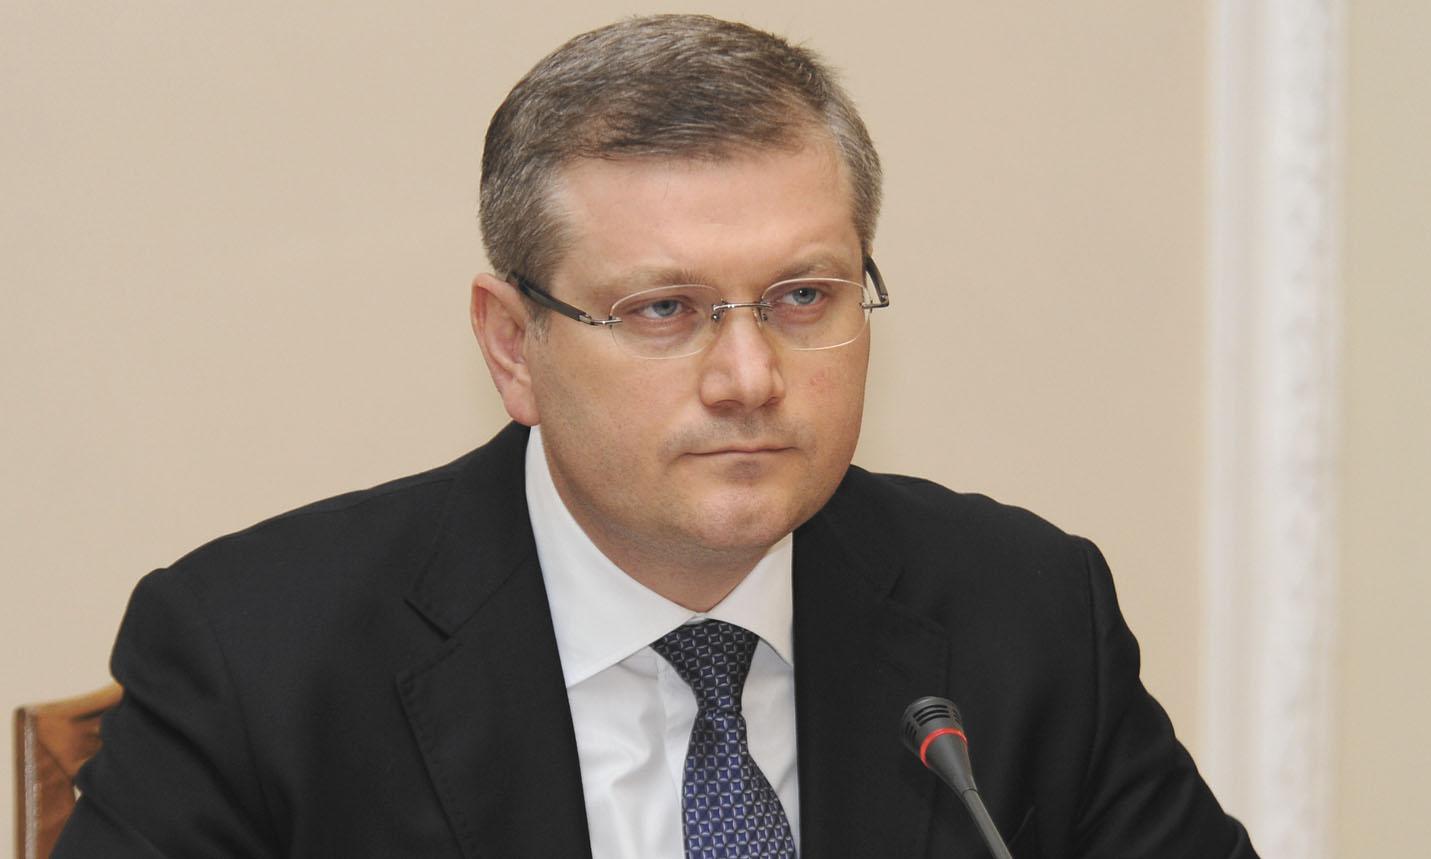 Вилкул сорвал эфир украинского ток-шоу, назвав